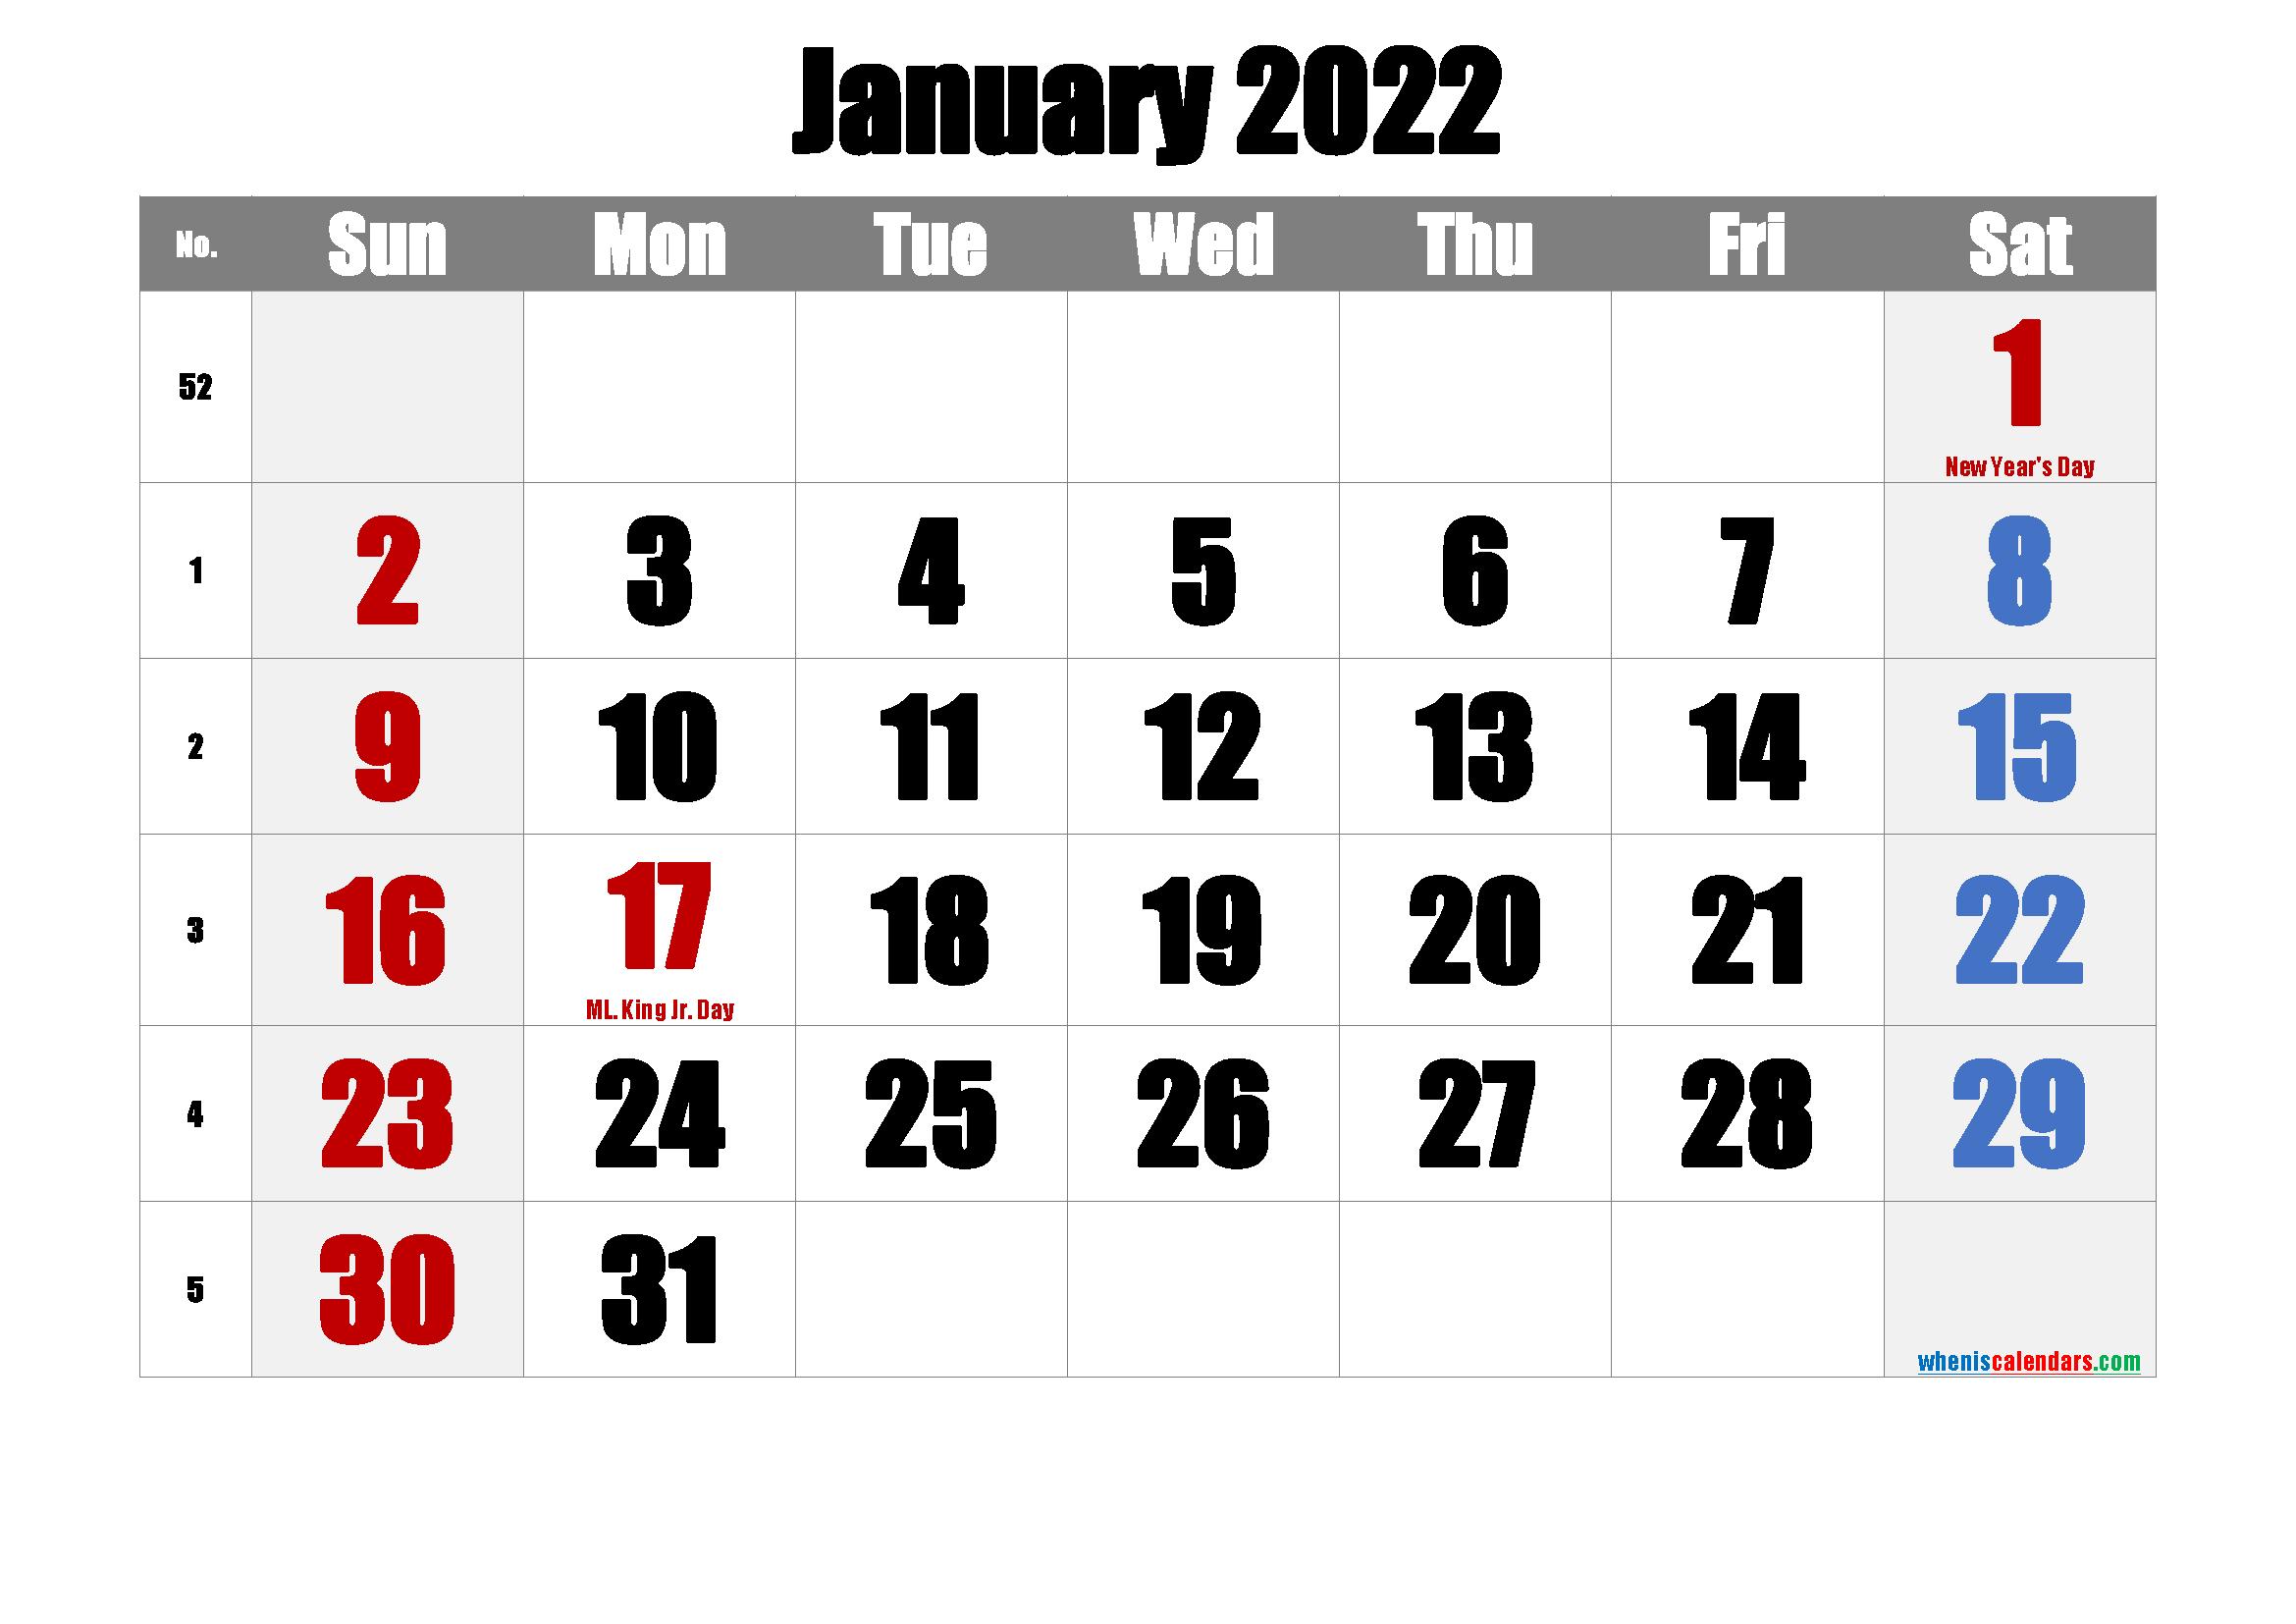 January 2022 Printable Calendar With Holidays - Free regarding January 2022 Calendar Pictures